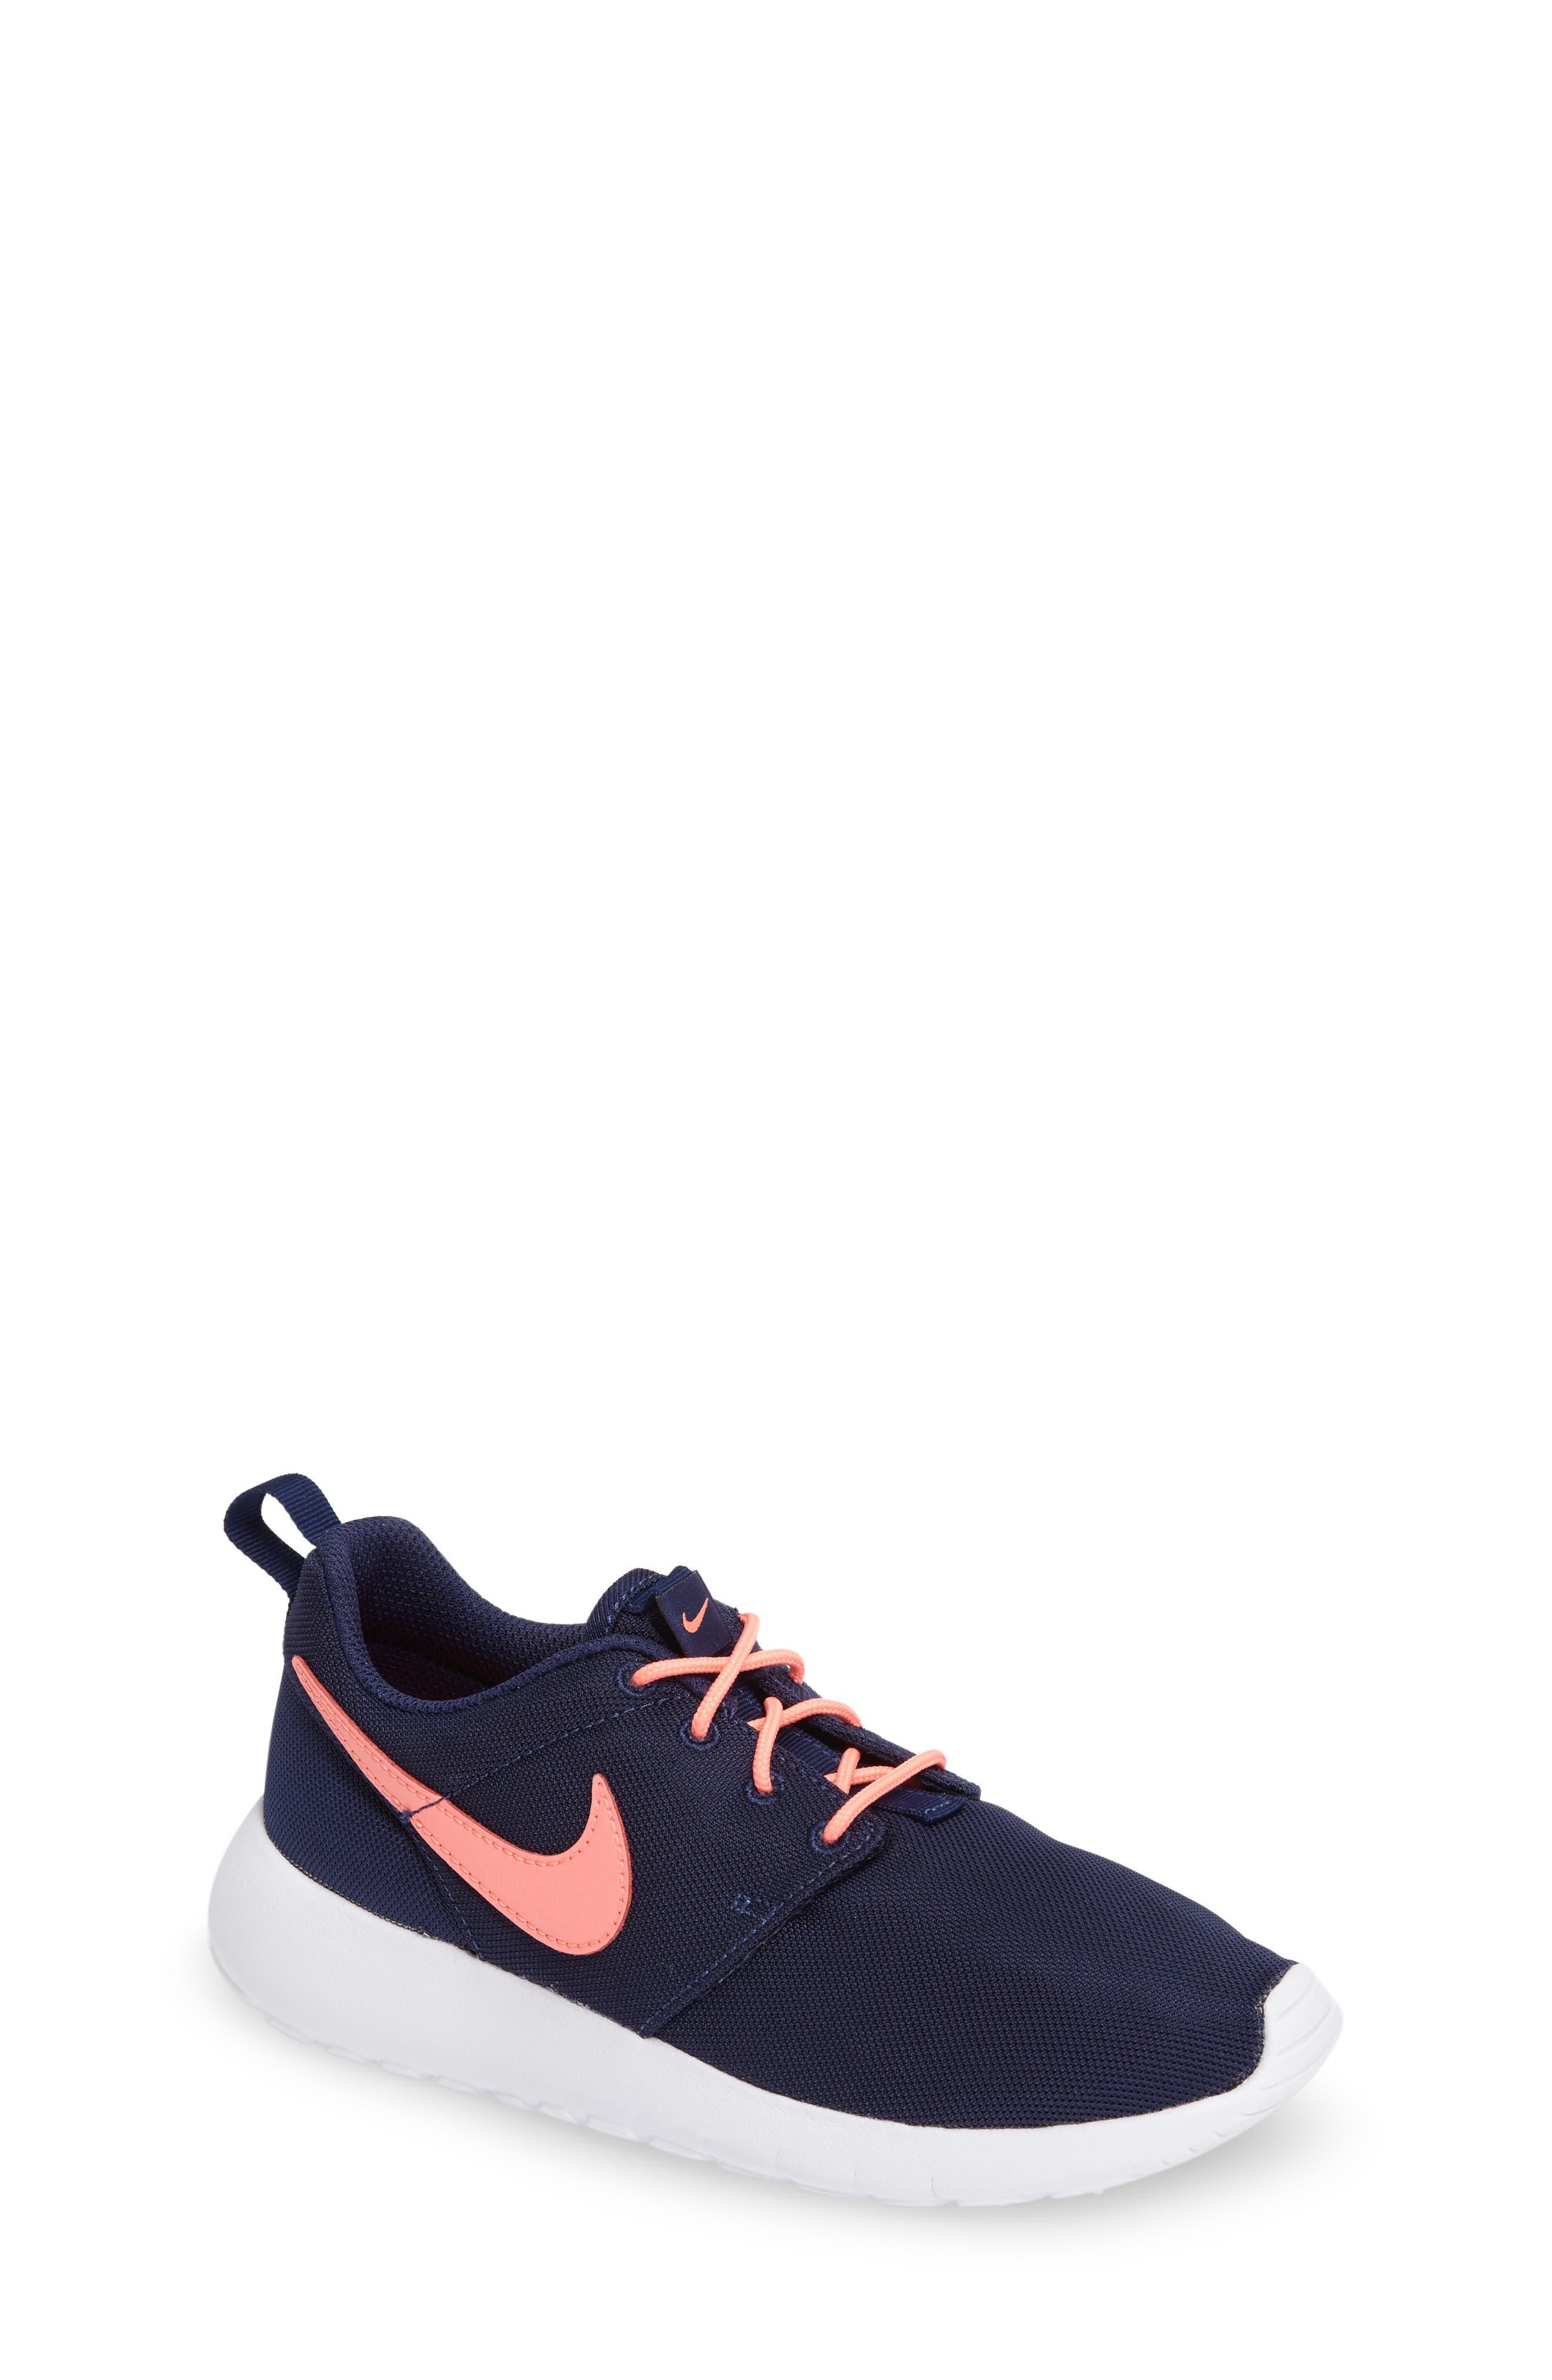 Alternate Image 1 Selected - Nike 'Roshe Run' Athletic Shoe (Little Kid & Big Kid)